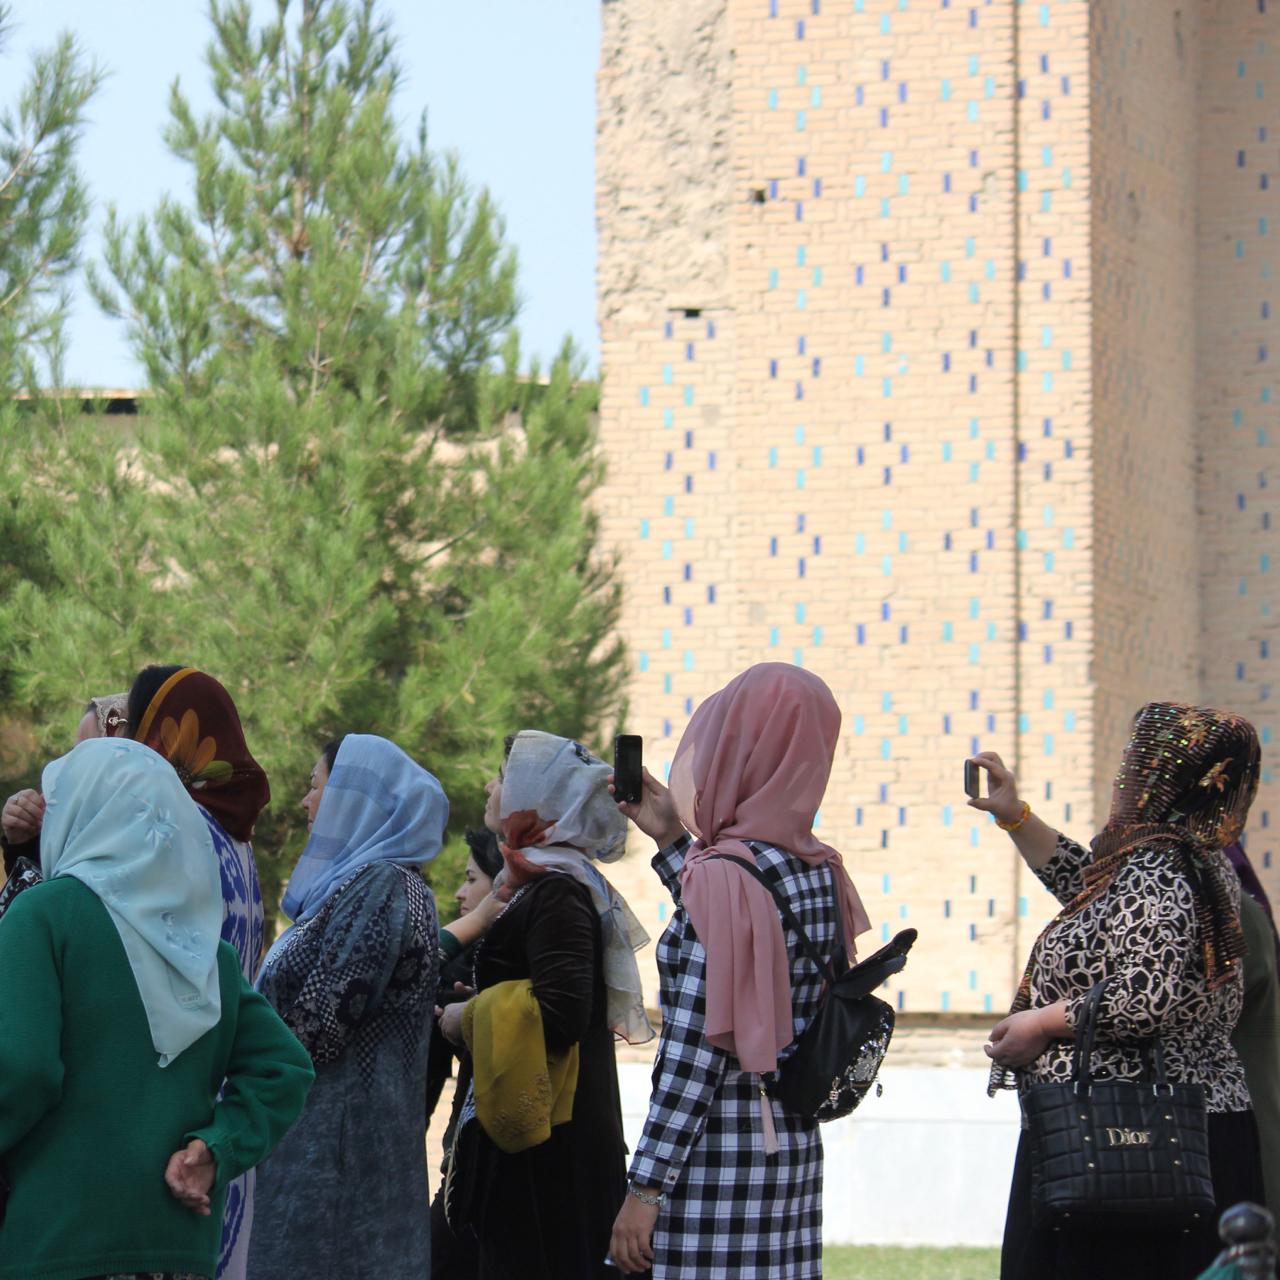 samarkand, uzbekistan - 11